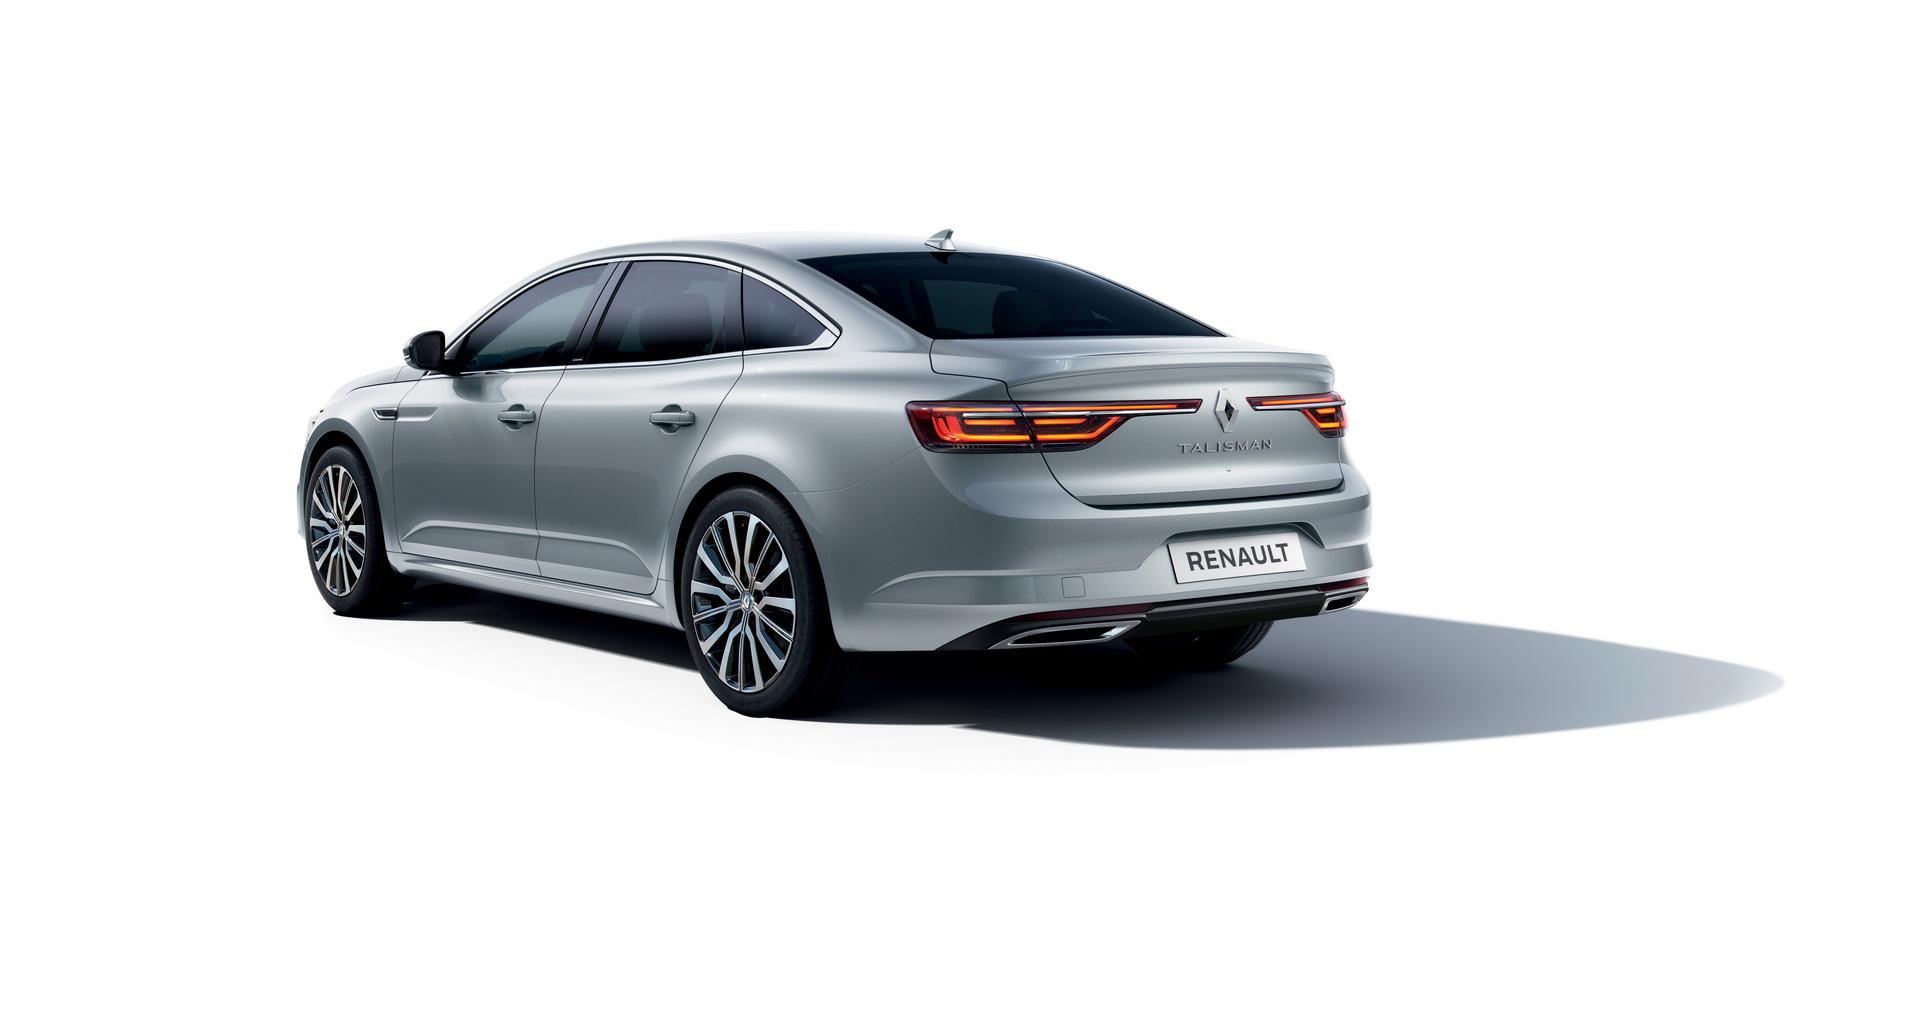 Renault-Talisman-facelift-2020-12